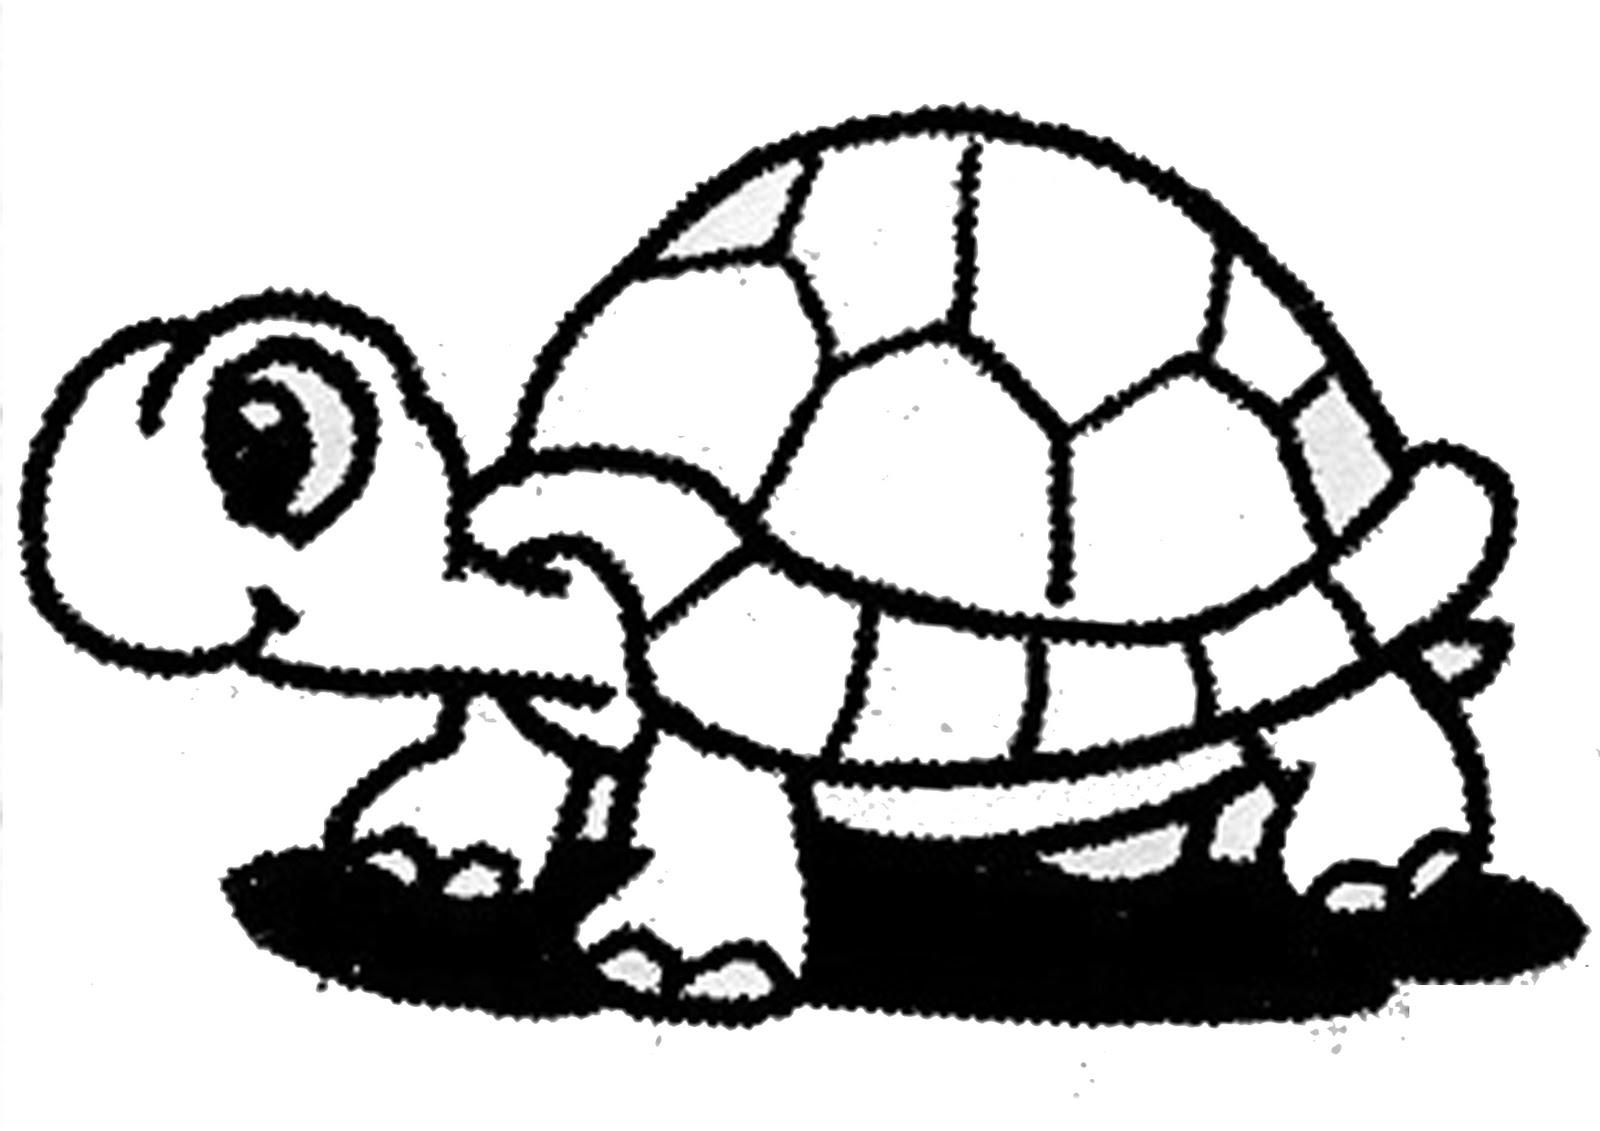 Gambar Keren Kartun Lucu 💕 💕 Gambar Zoo Kartun Hitam Putih